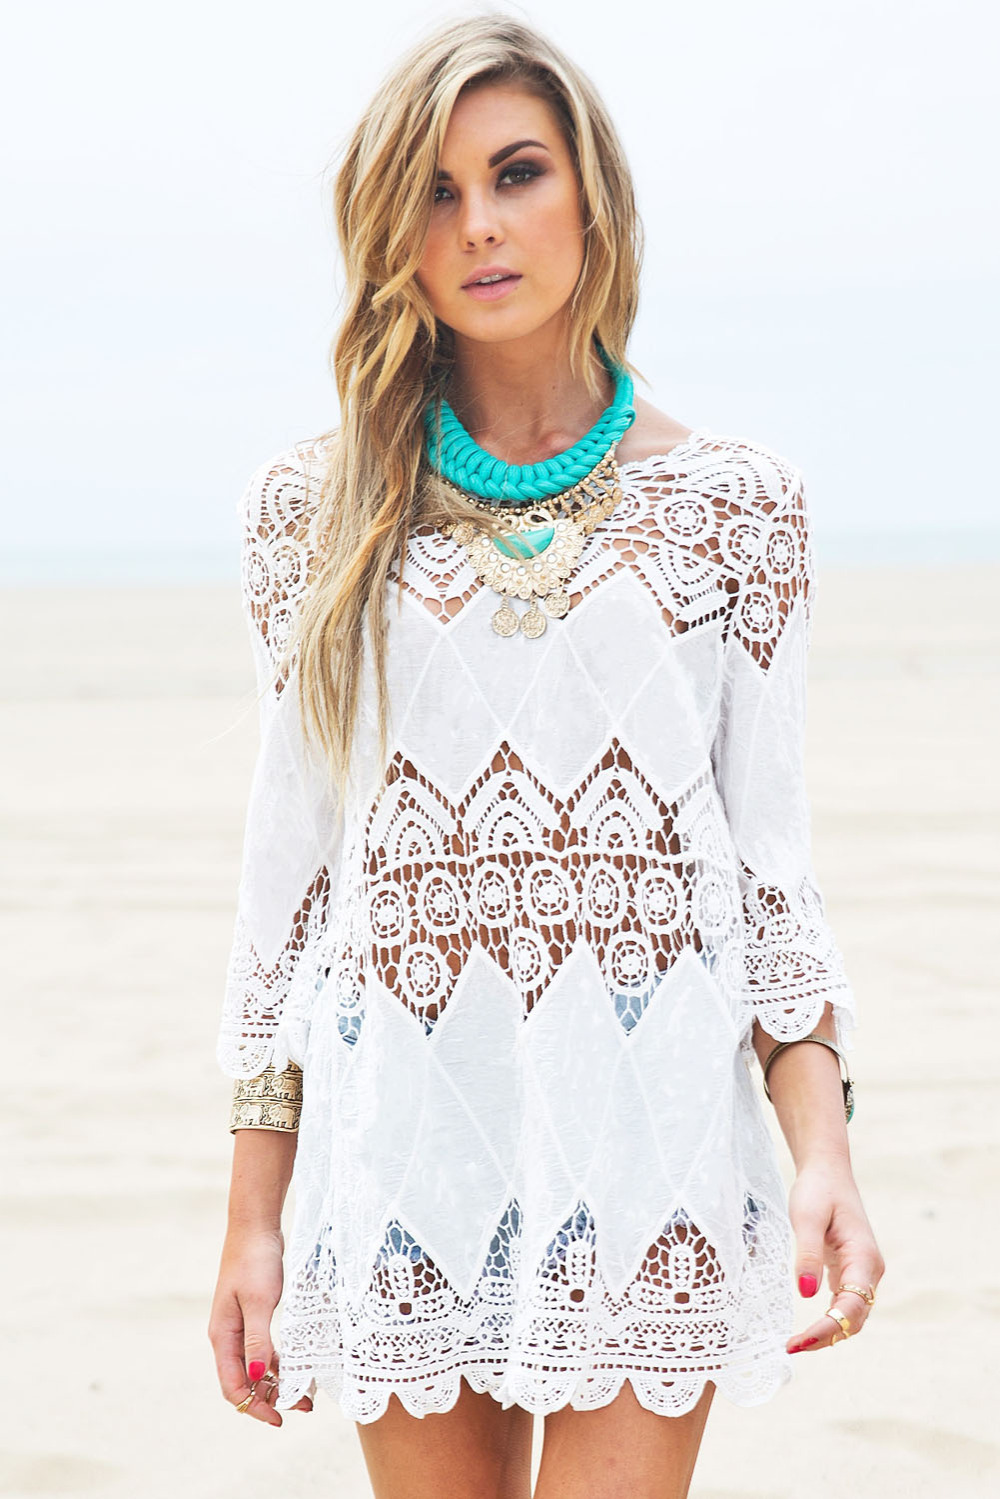 83feb8f8ea 2015 New Fashion Cotton Lace Hollow Crochet Sexy Swimwear Bikini Beach  Cover Up Women, White Beach Tunic Shirt Dress, In Stock